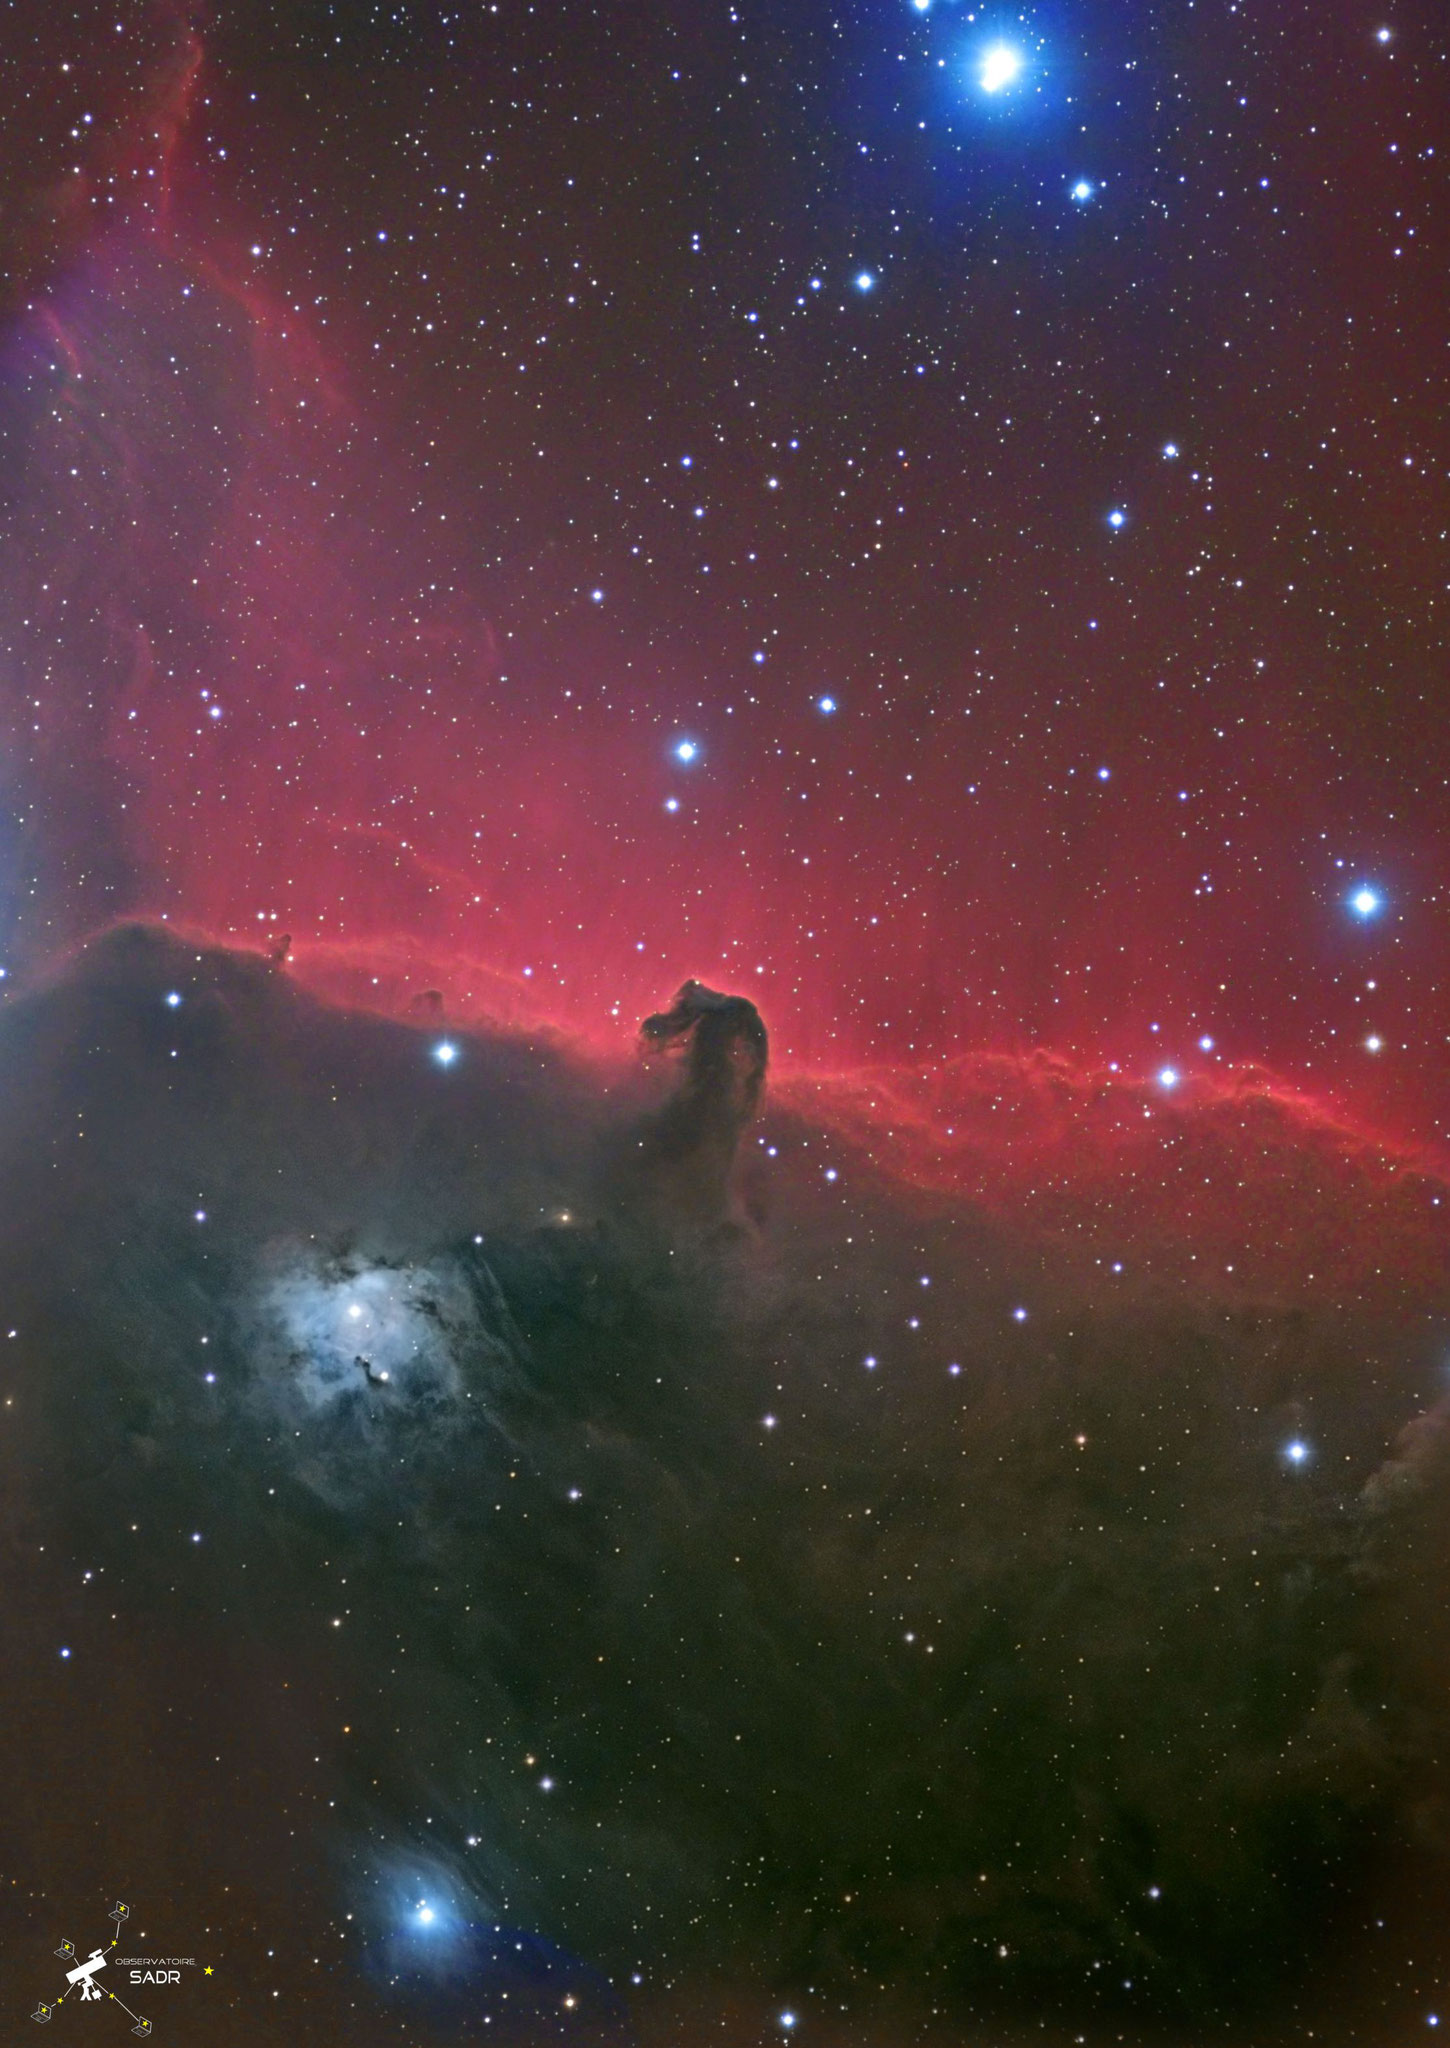 Barnard 33, la tête de cheval, L127, HaLRVB = 19h05, LSD Team, Sadr Chili